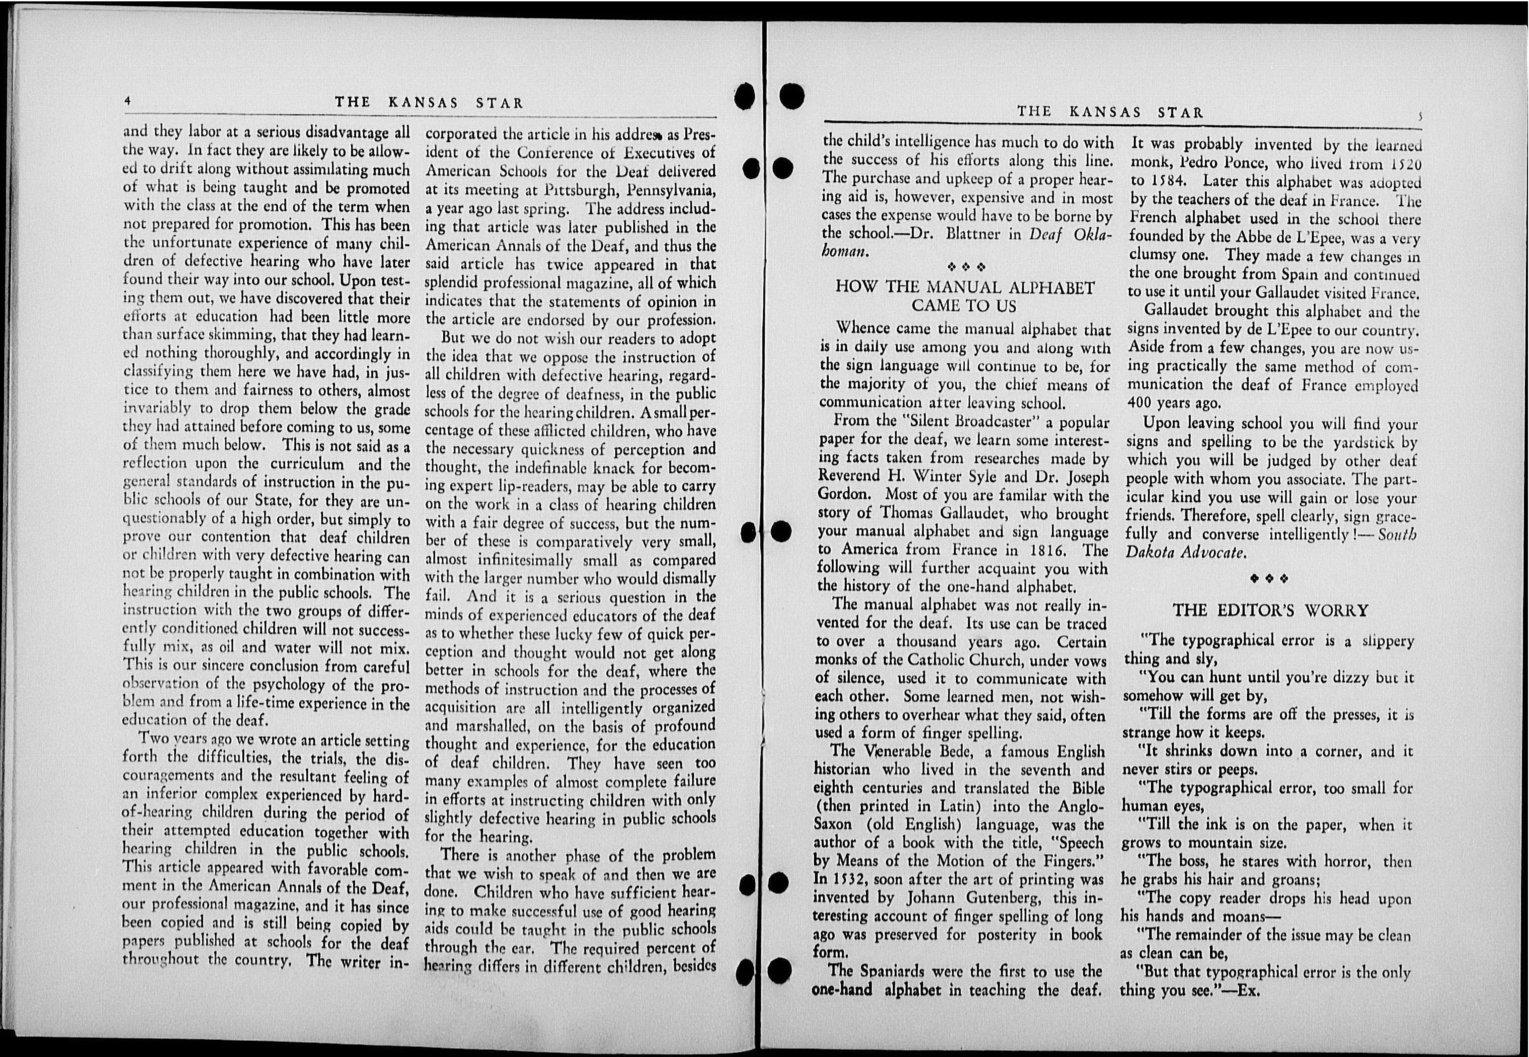 The Kansas Star, volume 52, number 6 - 4-5